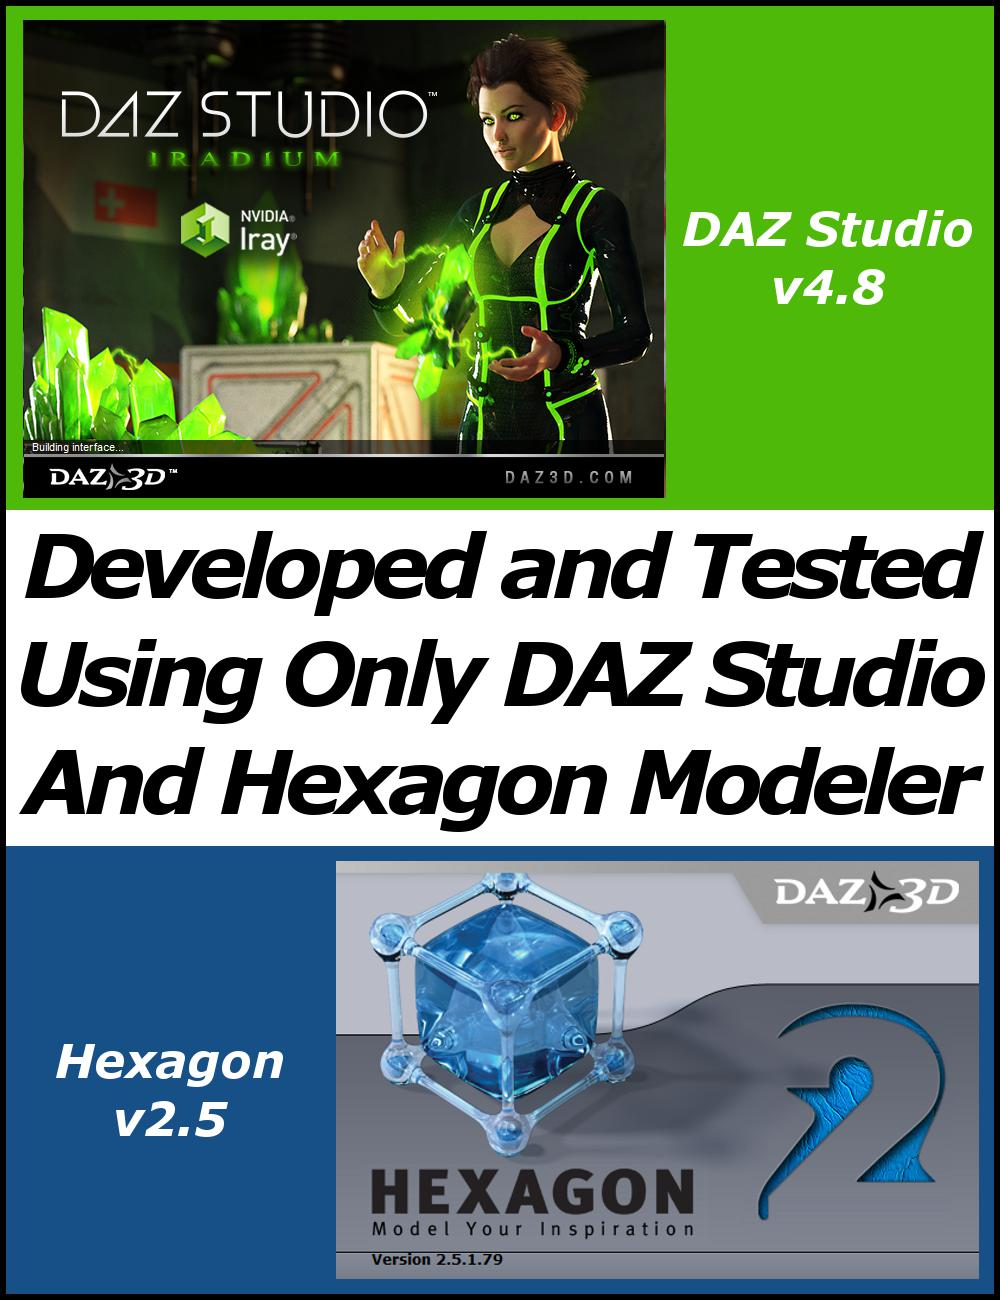 Daz studio 4 genesis freebies - Mydealz de freebies